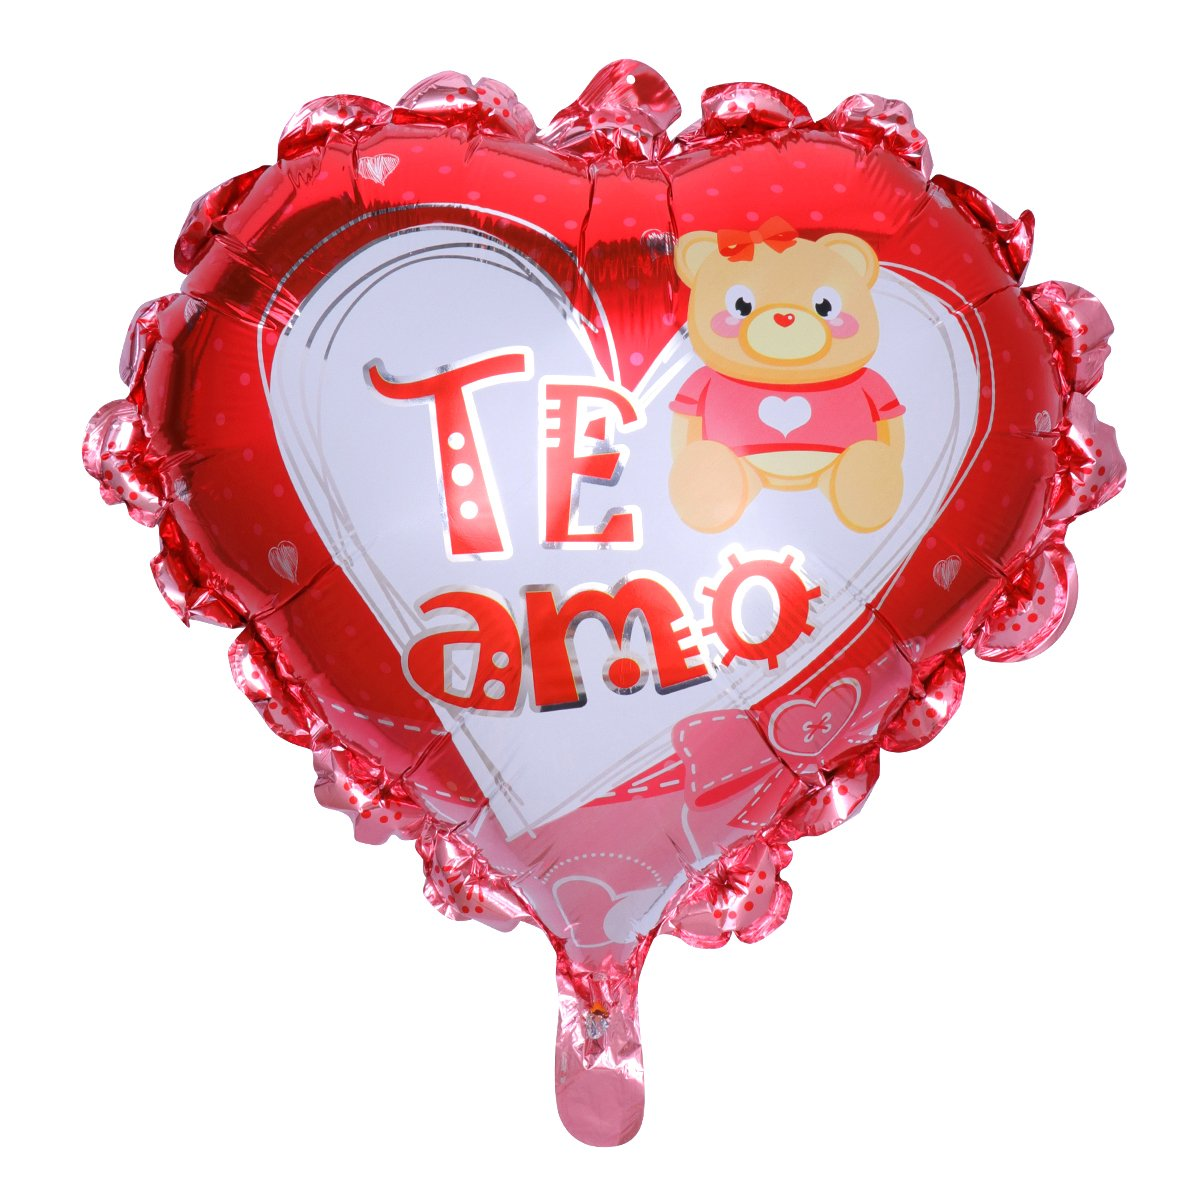 Amo espanol clipart clip transparent 6pcs 24 inch Te Amo Balloons Heart Shape Aluminum Foil Balloons for ... clip transparent